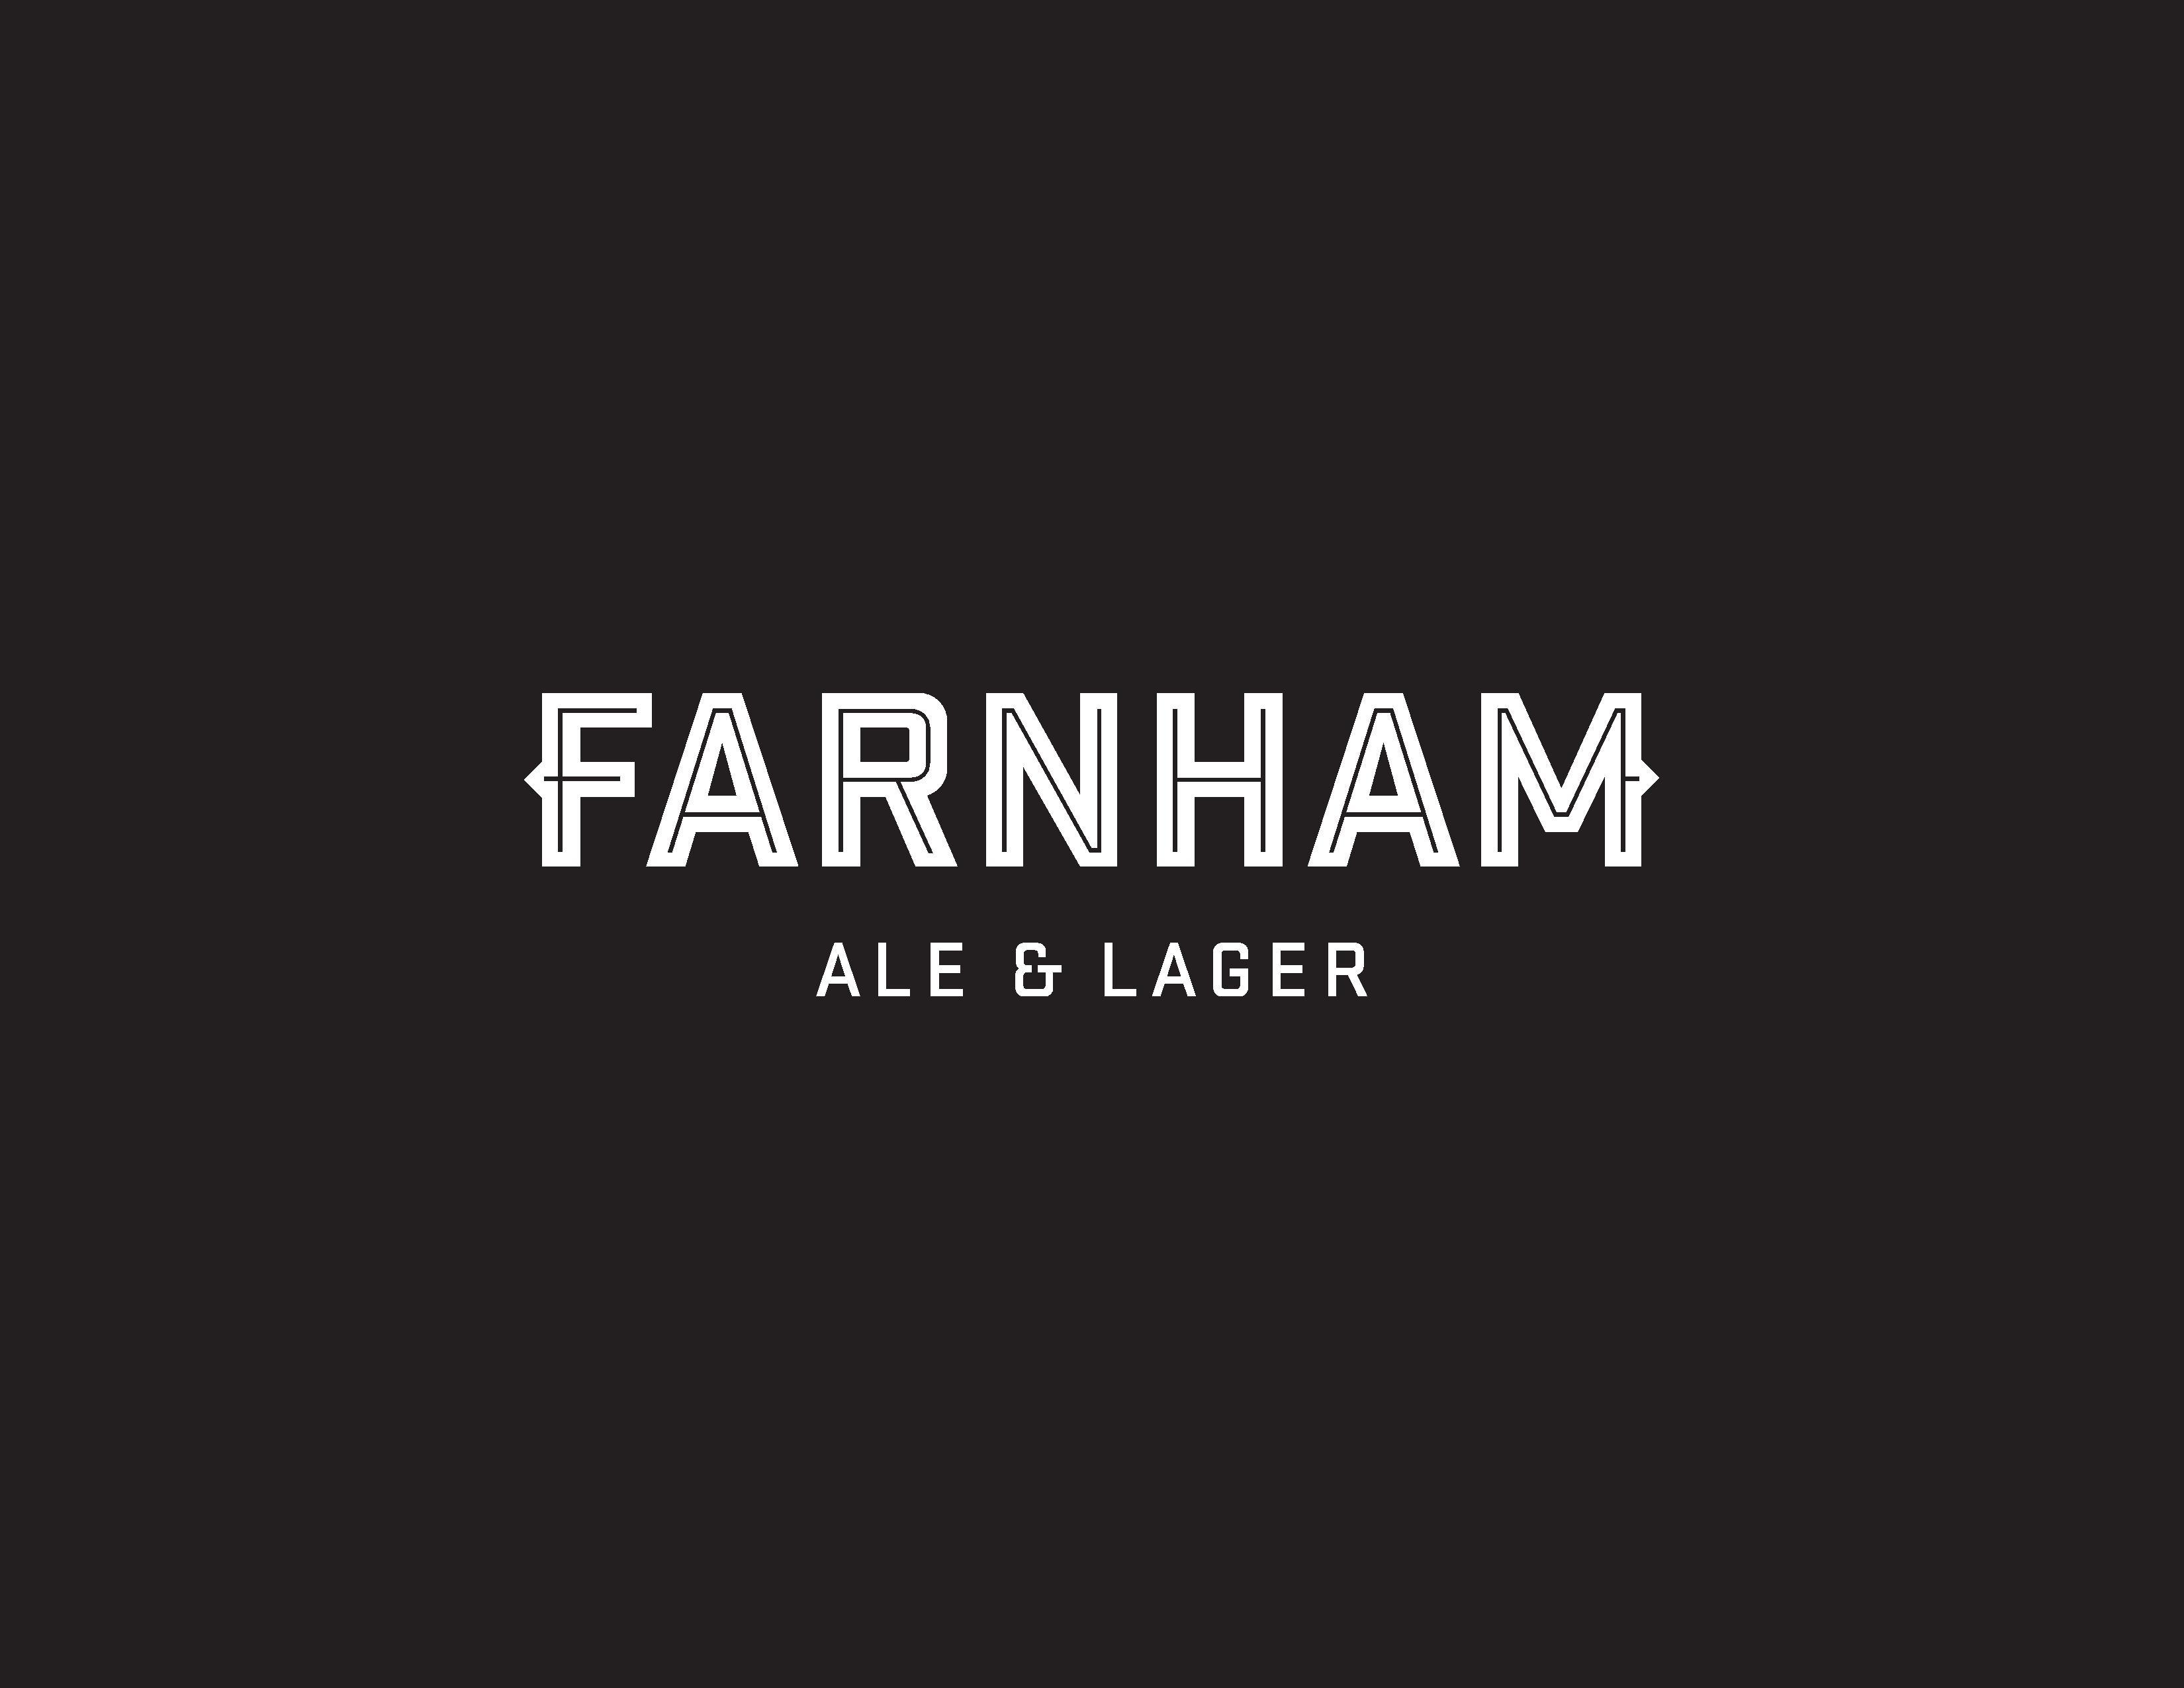 Microbrasserie Farnham